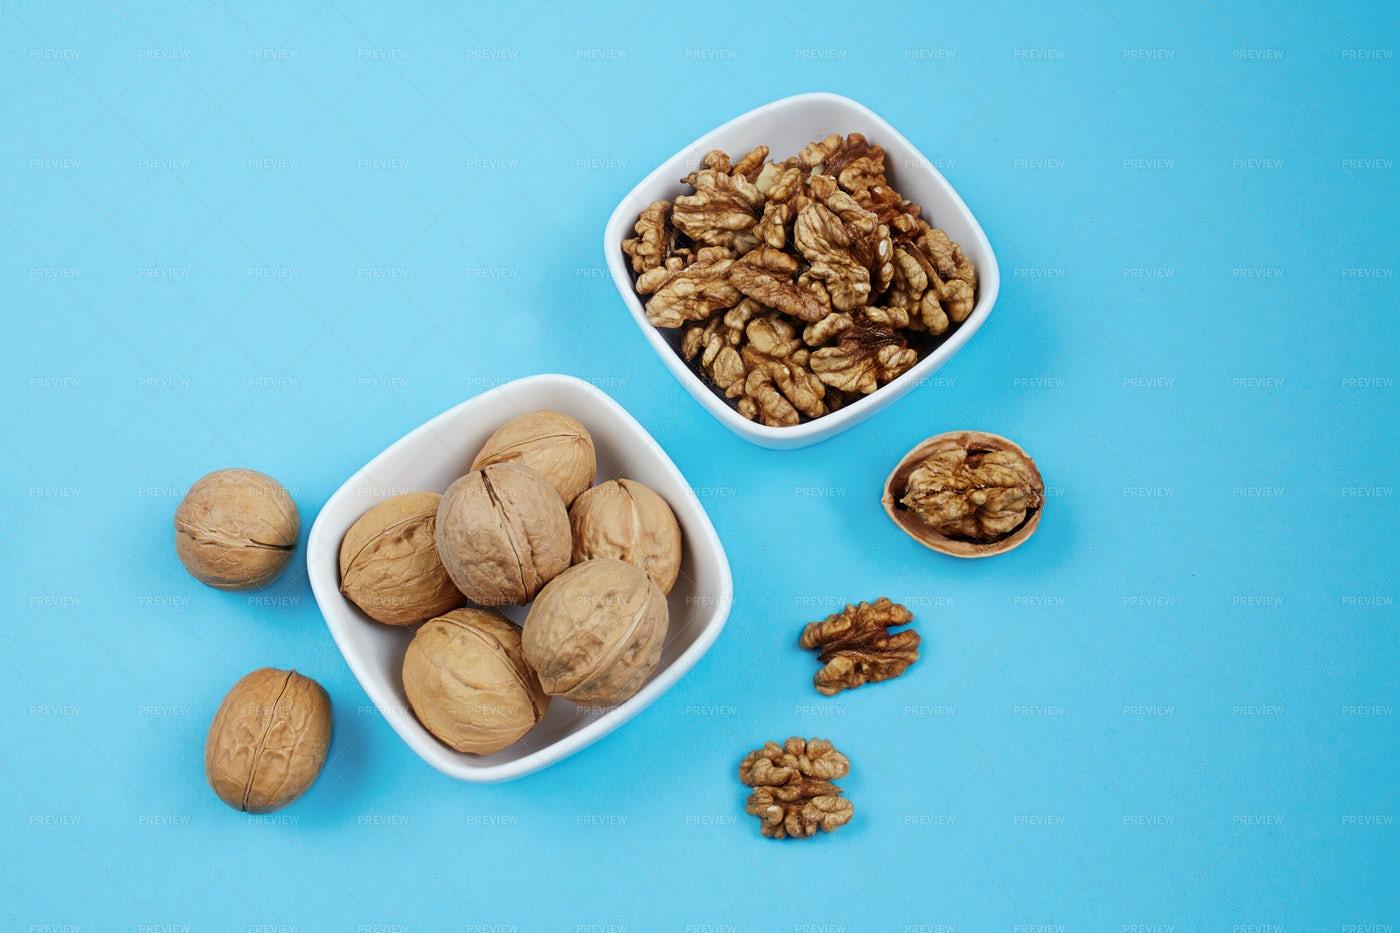 Walnut Kernels In  Bowls: Stock Photos